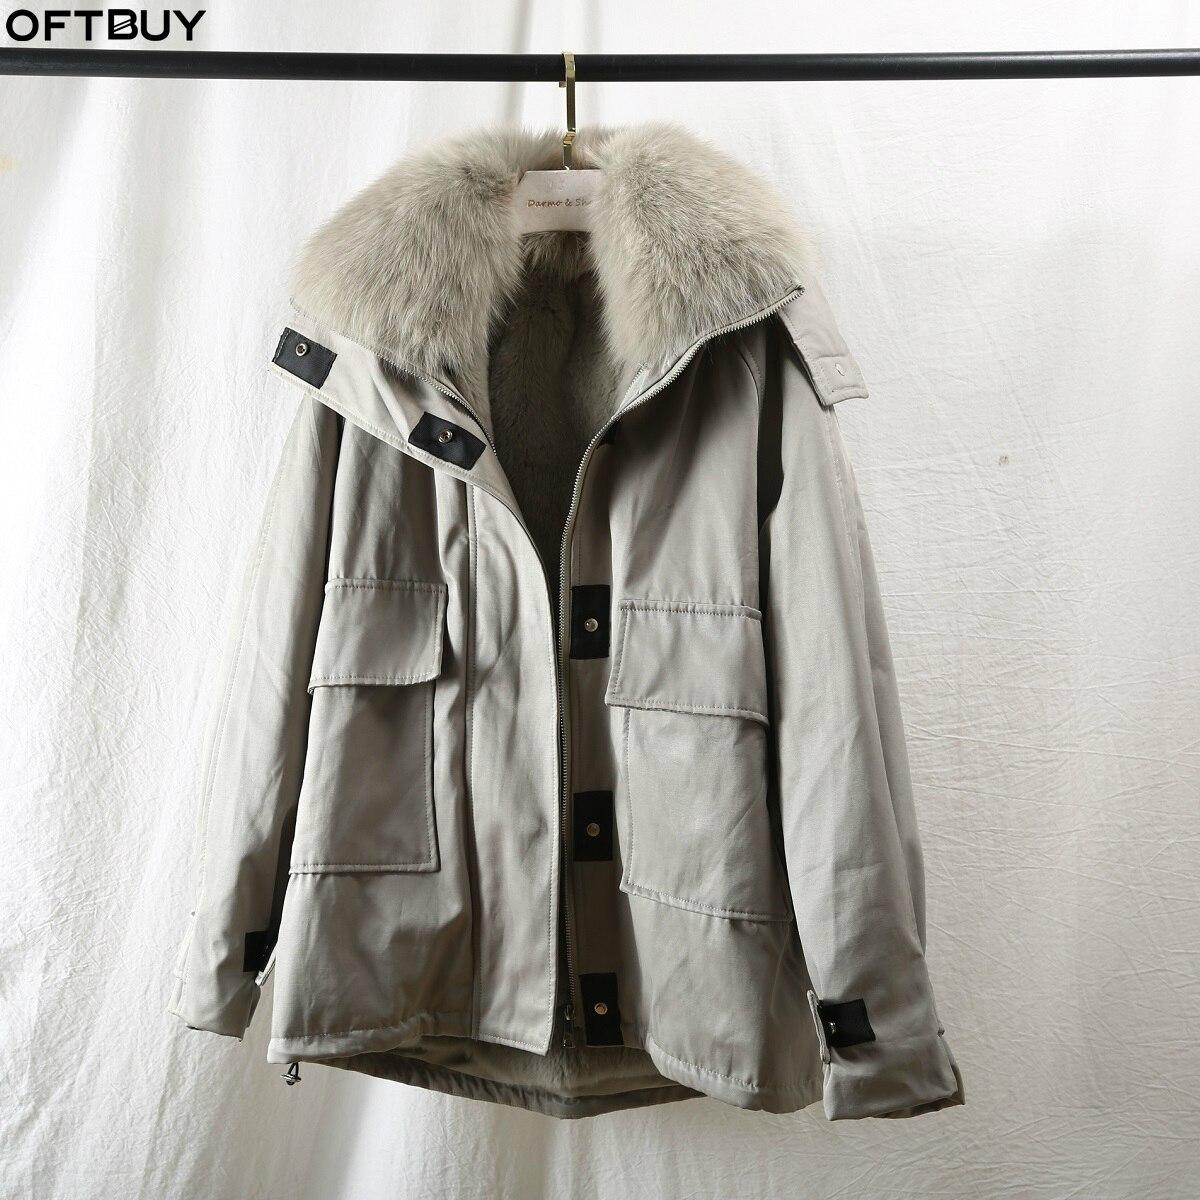 OFTBUY 2019 Safari Style Parka Real Fur Coat Winter Jacket Women Natural Fox Fur Collar Rex Rabbit Liner Outerwear Detachable